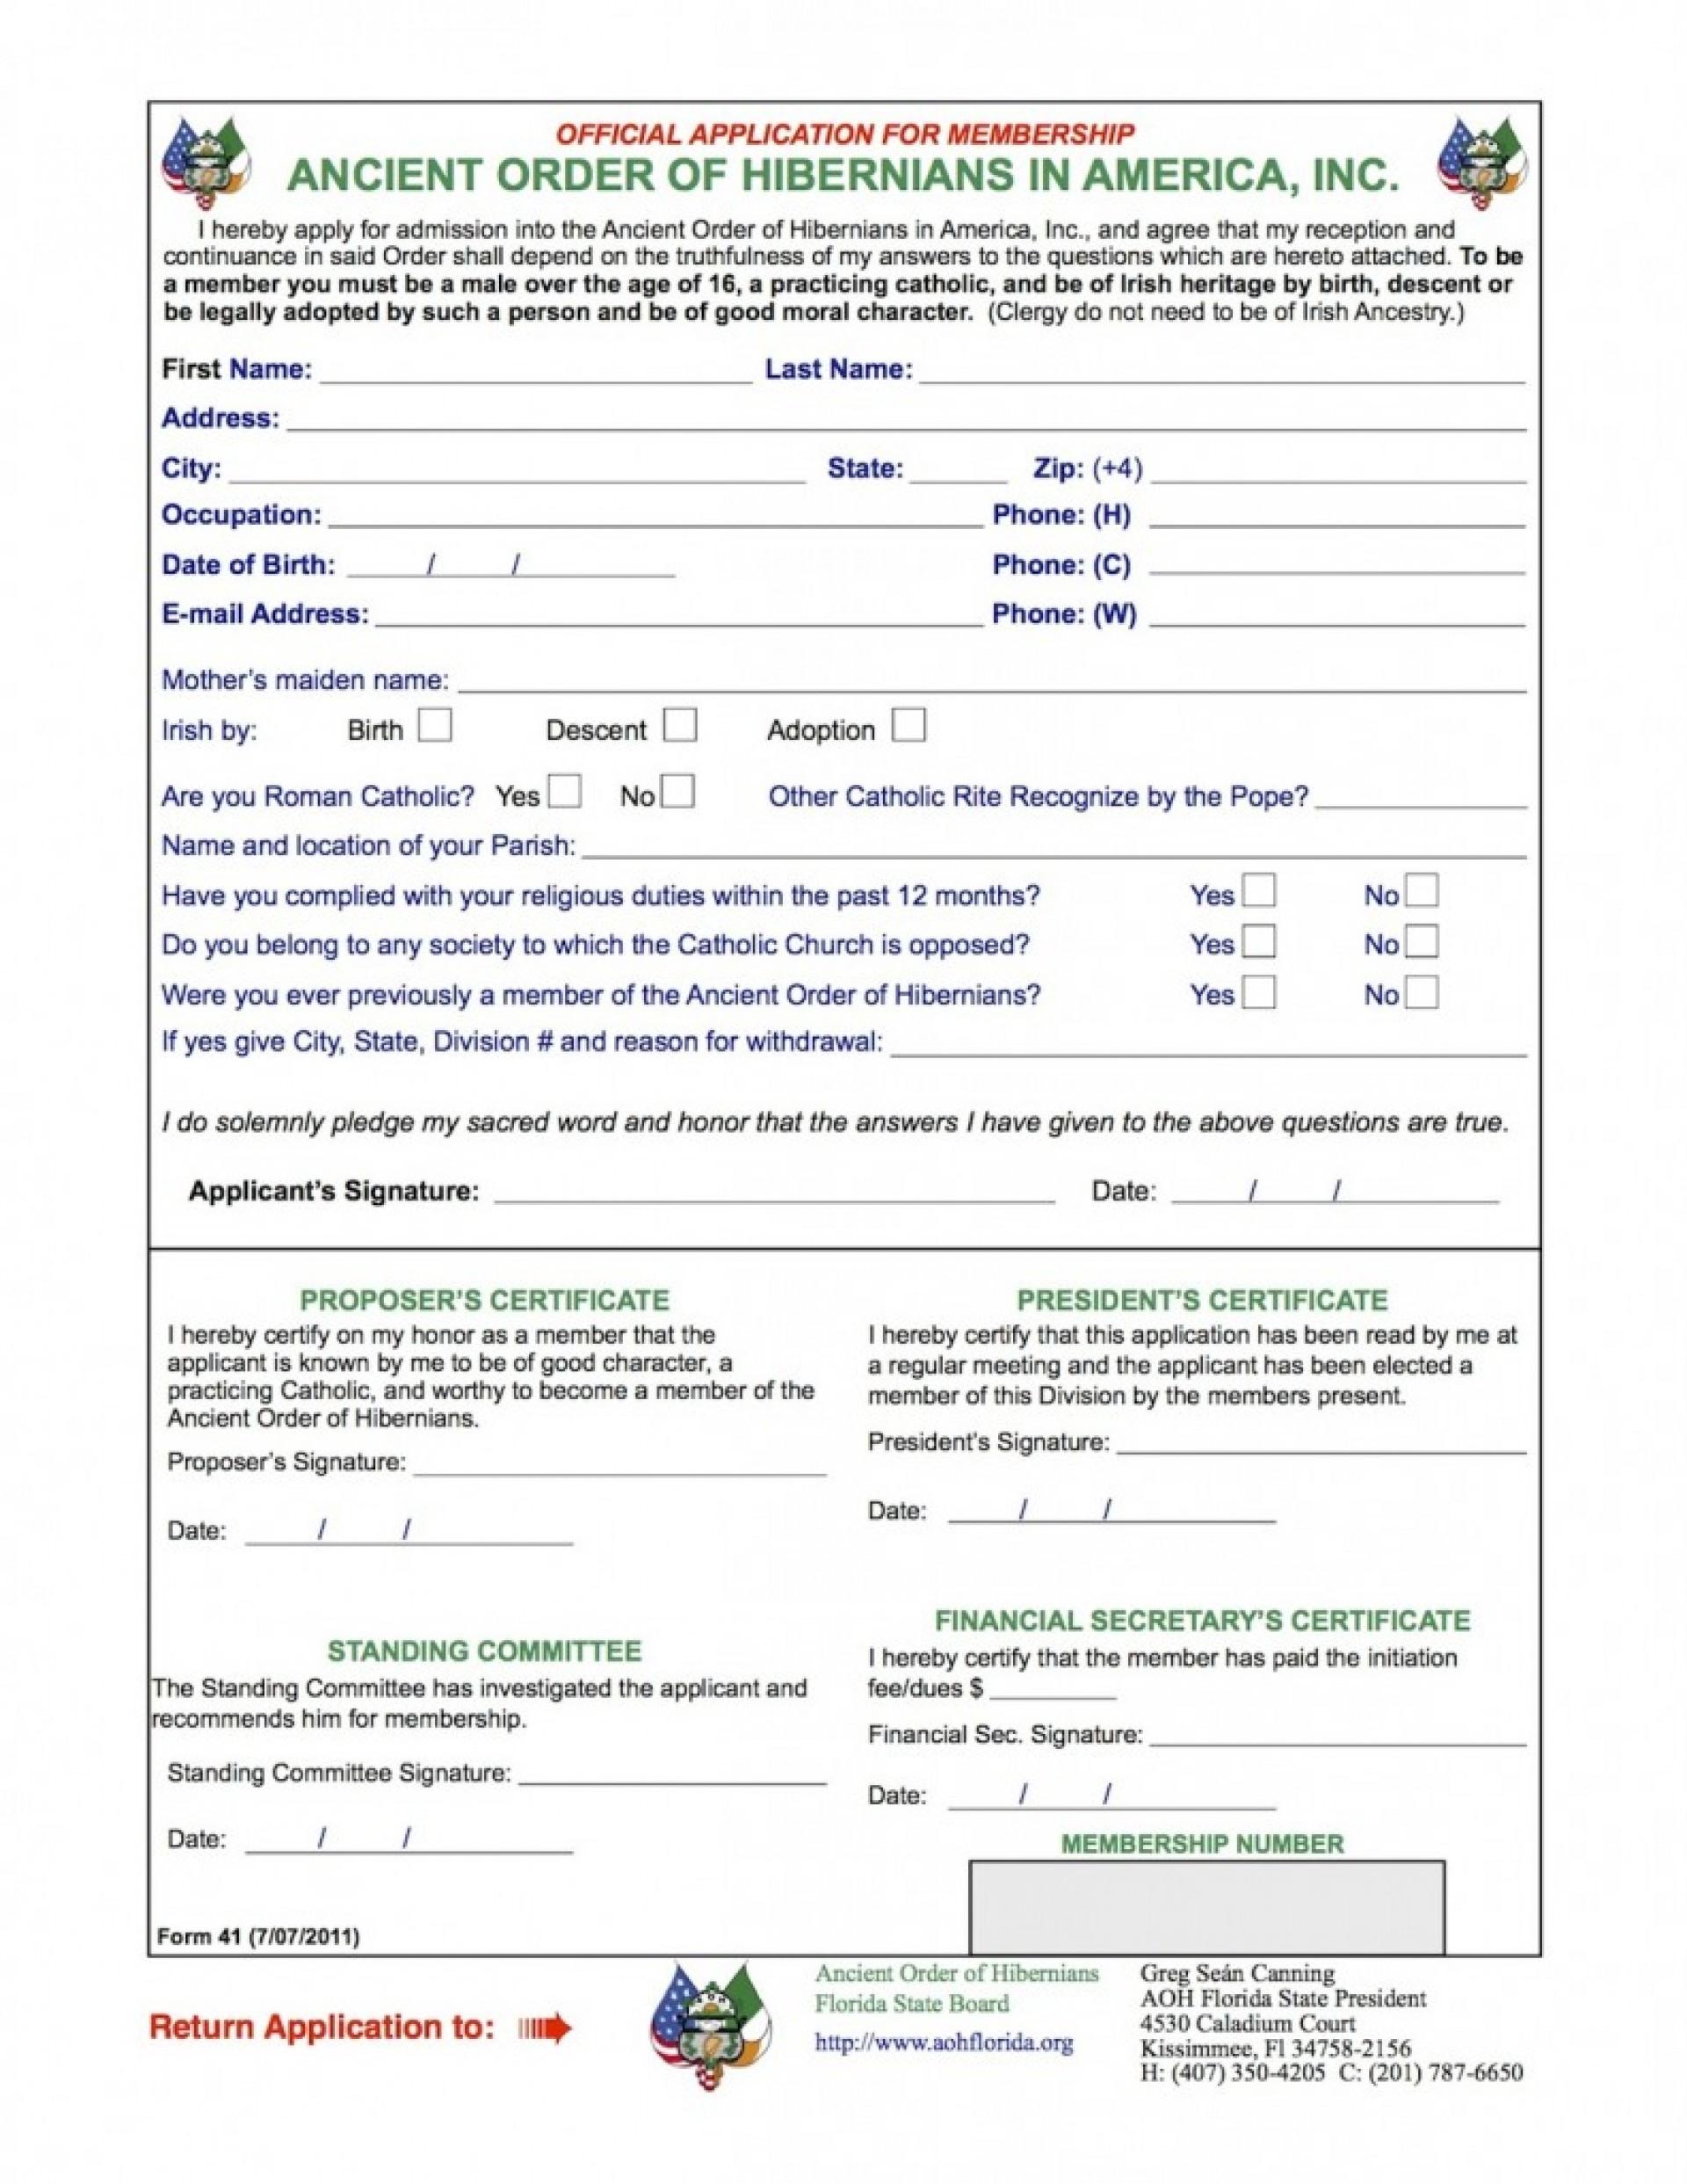 008 Florida State Admissions Essay Application University Admission Sample U Example Remarkable Fsu 1920